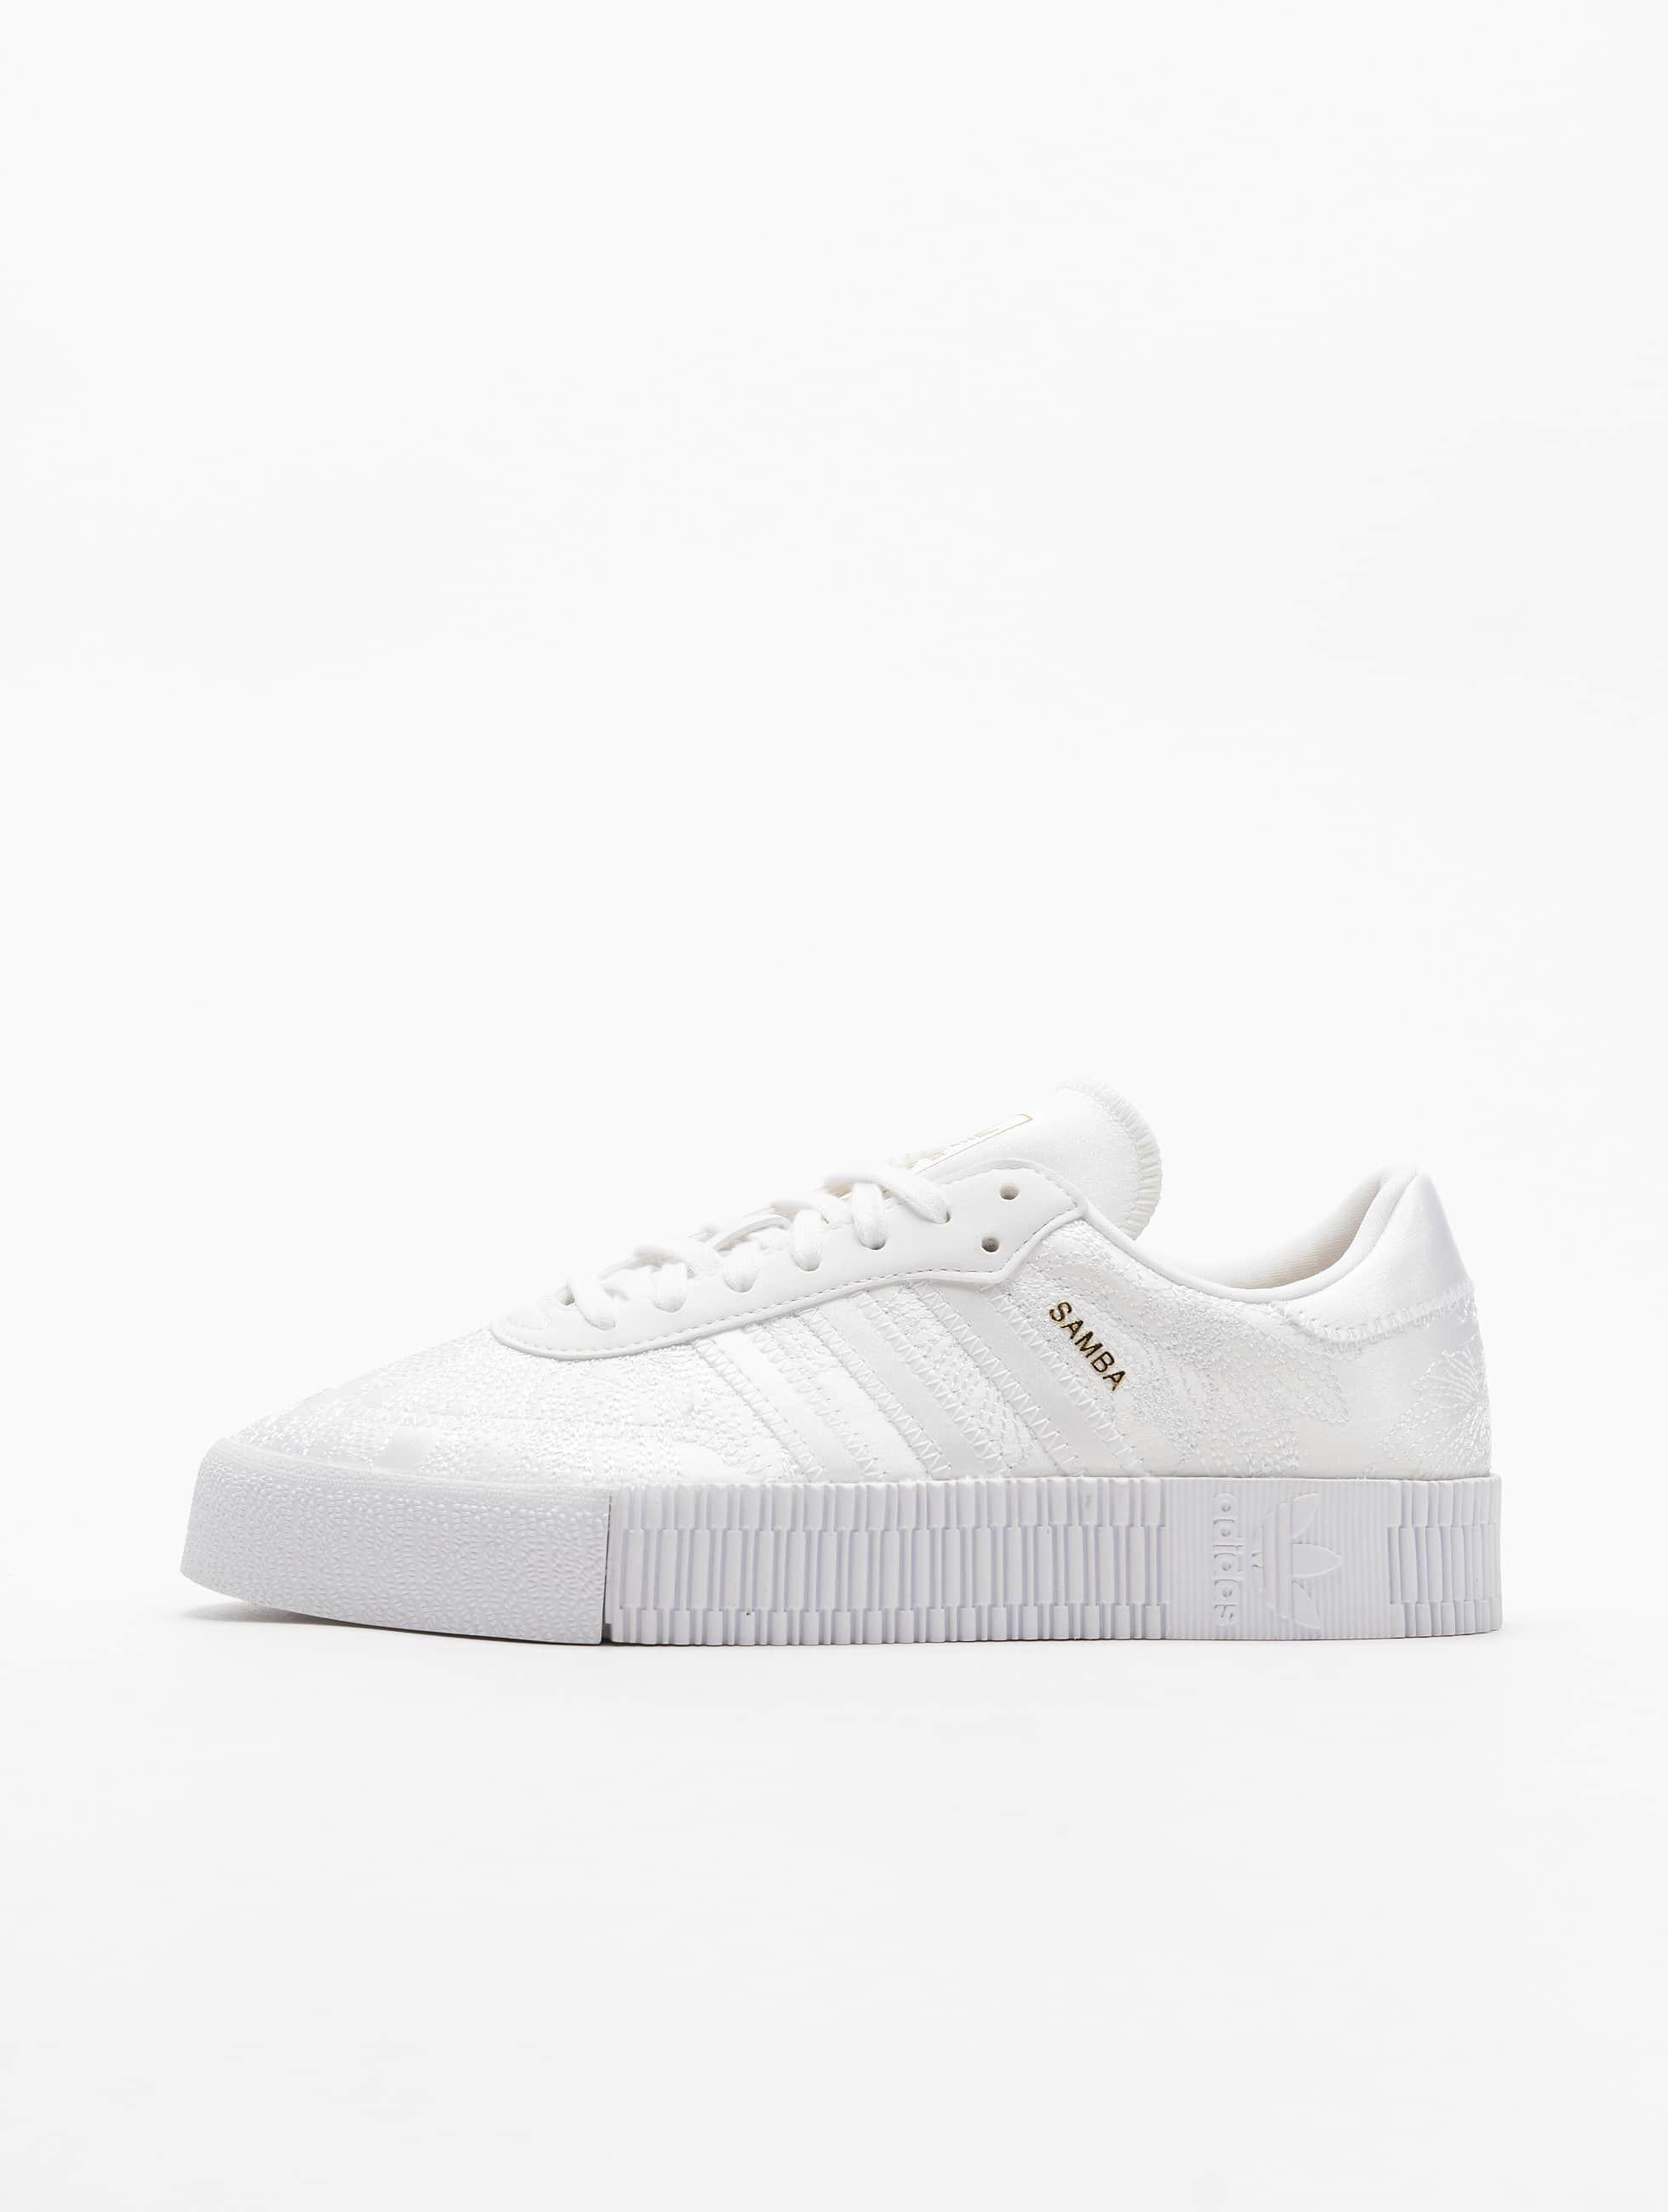 adidas Originals Sambarose Sneakers Ftwr WhiteFtwr WhiteGolden Met.